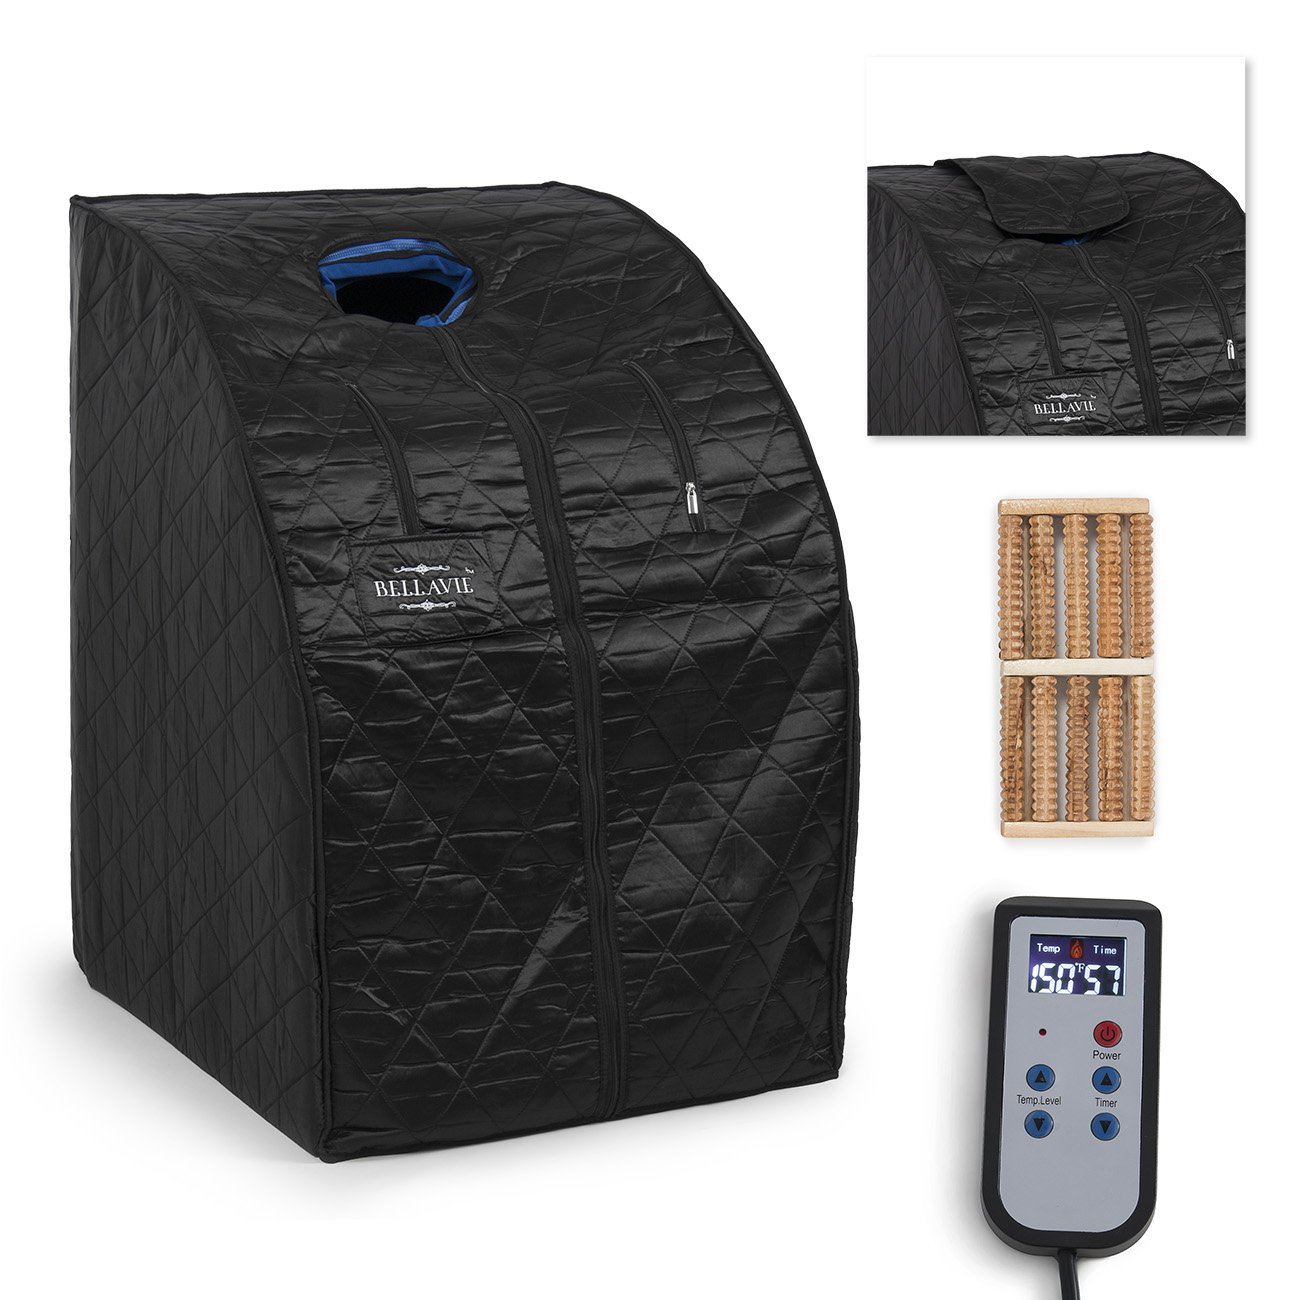 Bellavie Portable Therapeutic Infrared Sauna Spa XL FIR Full Body Portable w/ Chair (Black)